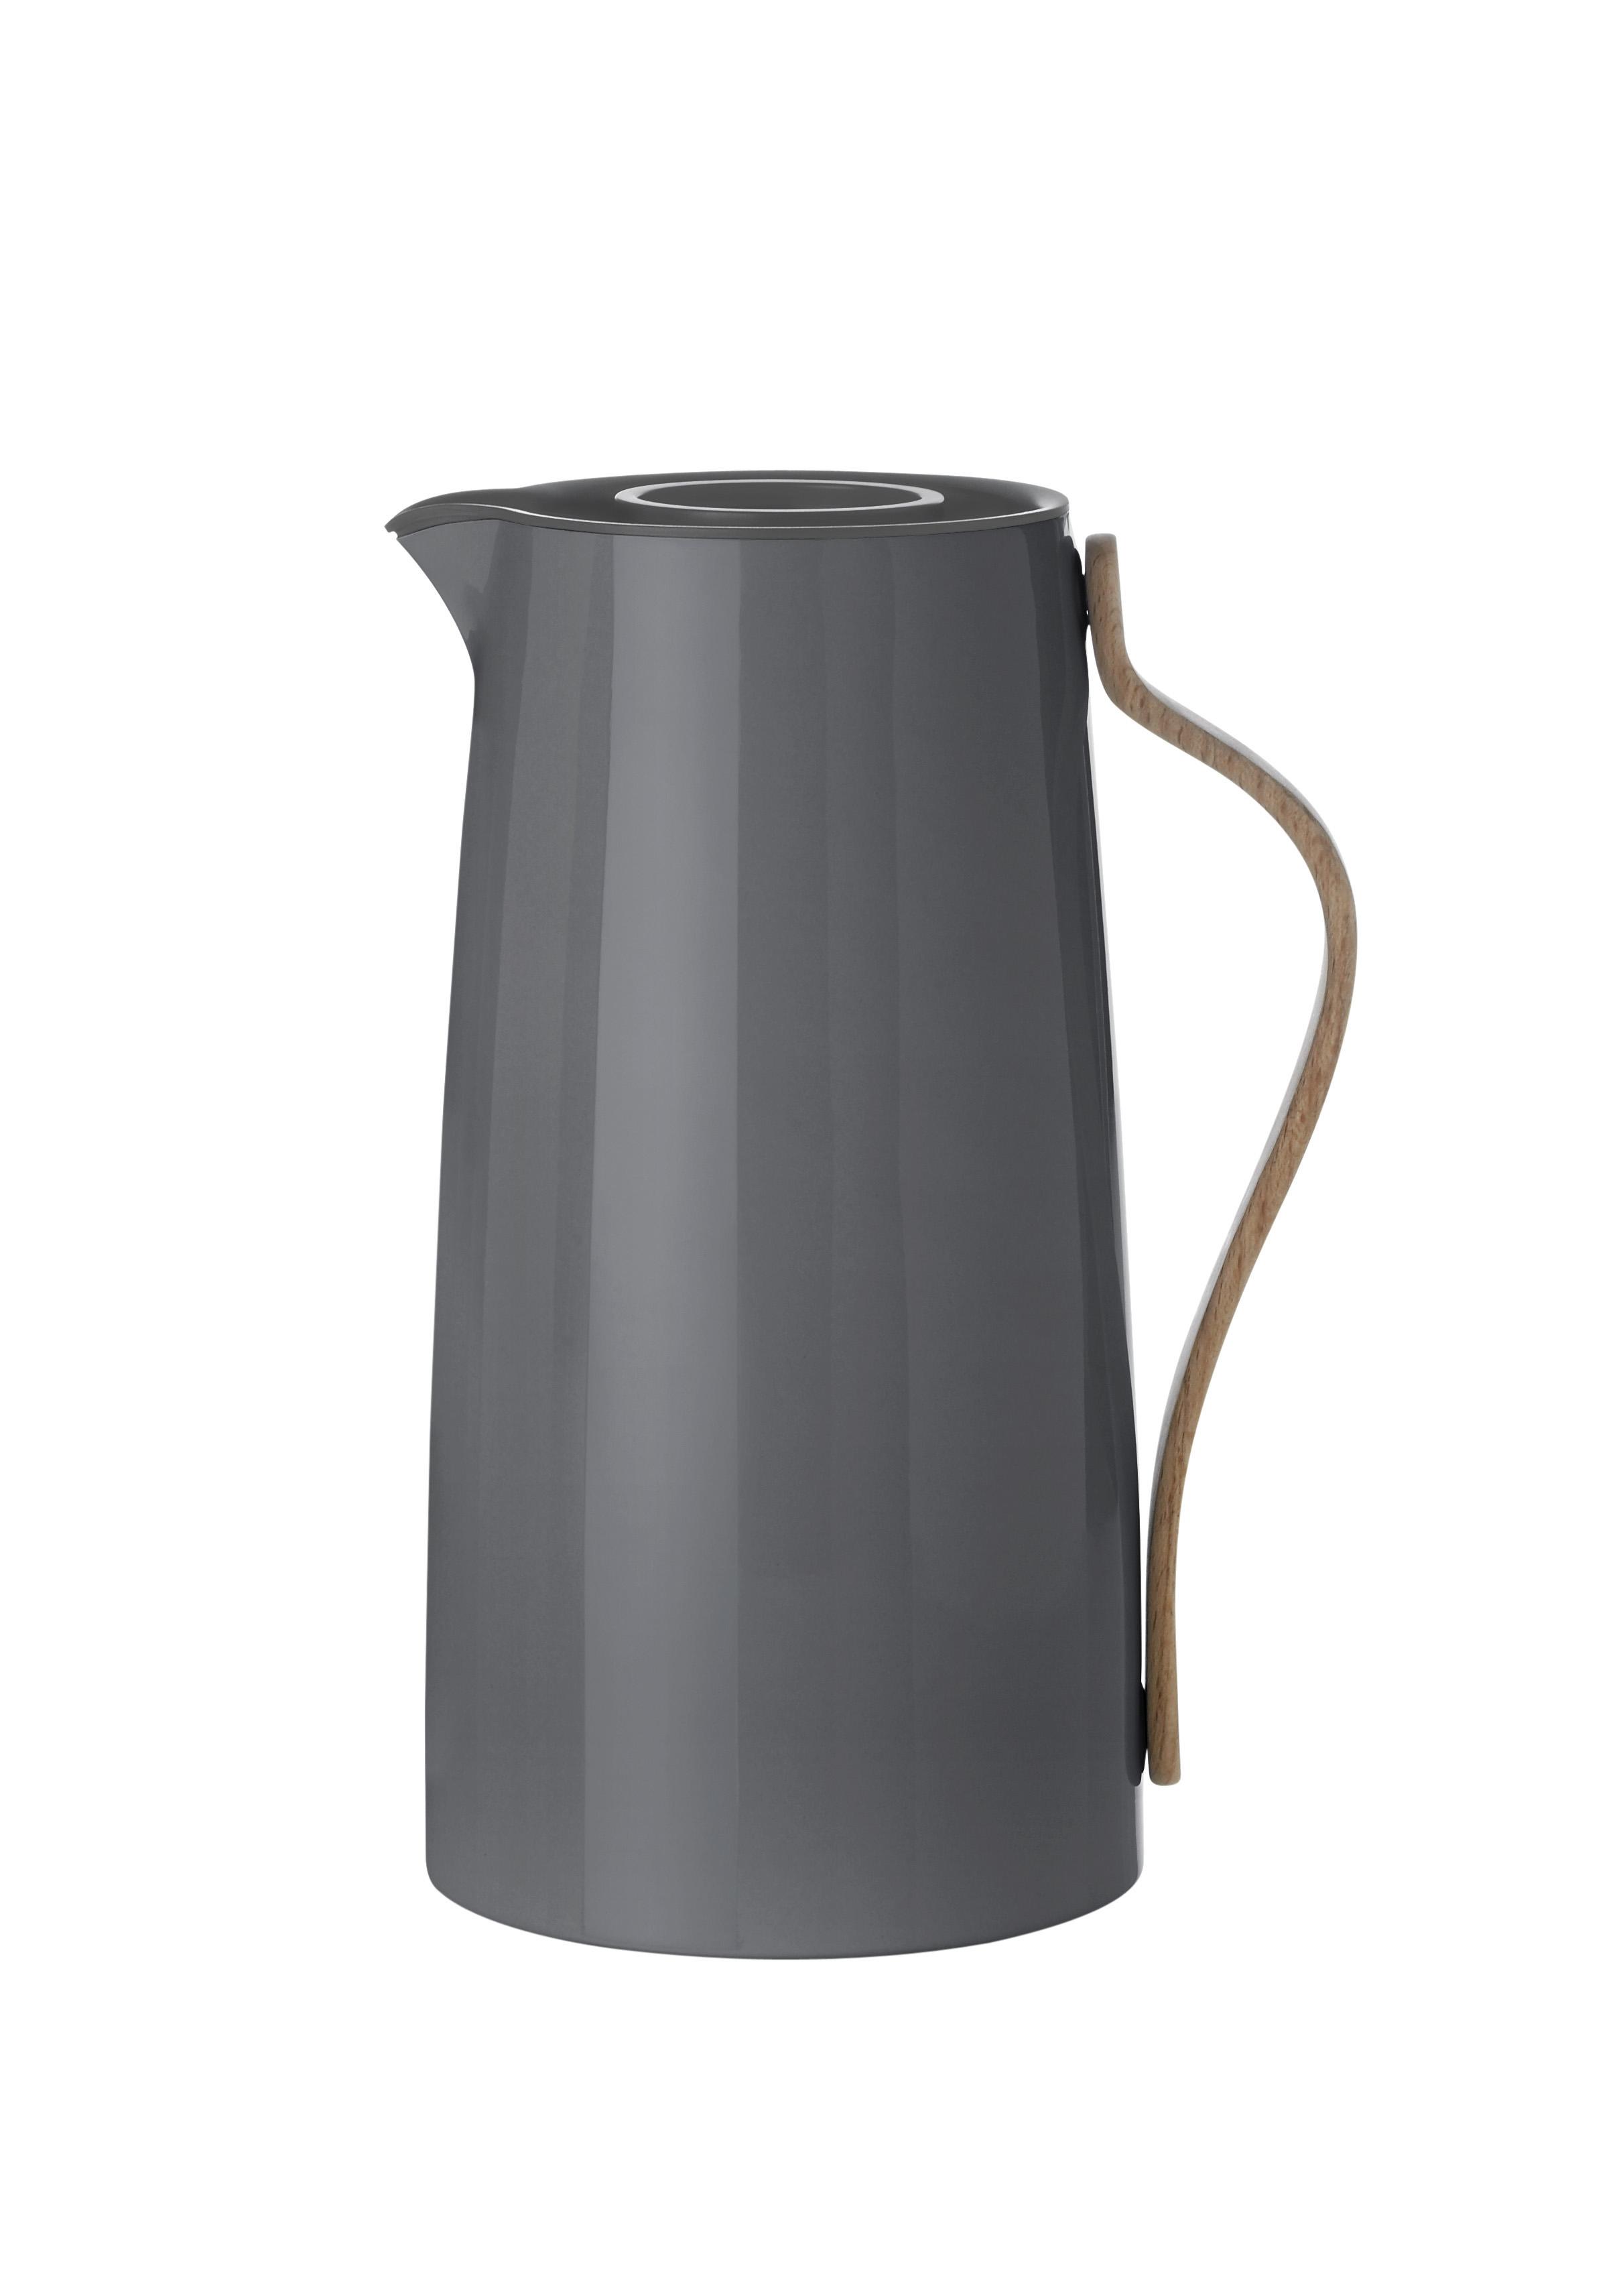 Stelton - Emma Coffee Thermo 1,2 L - Grey ( x-200-1 )